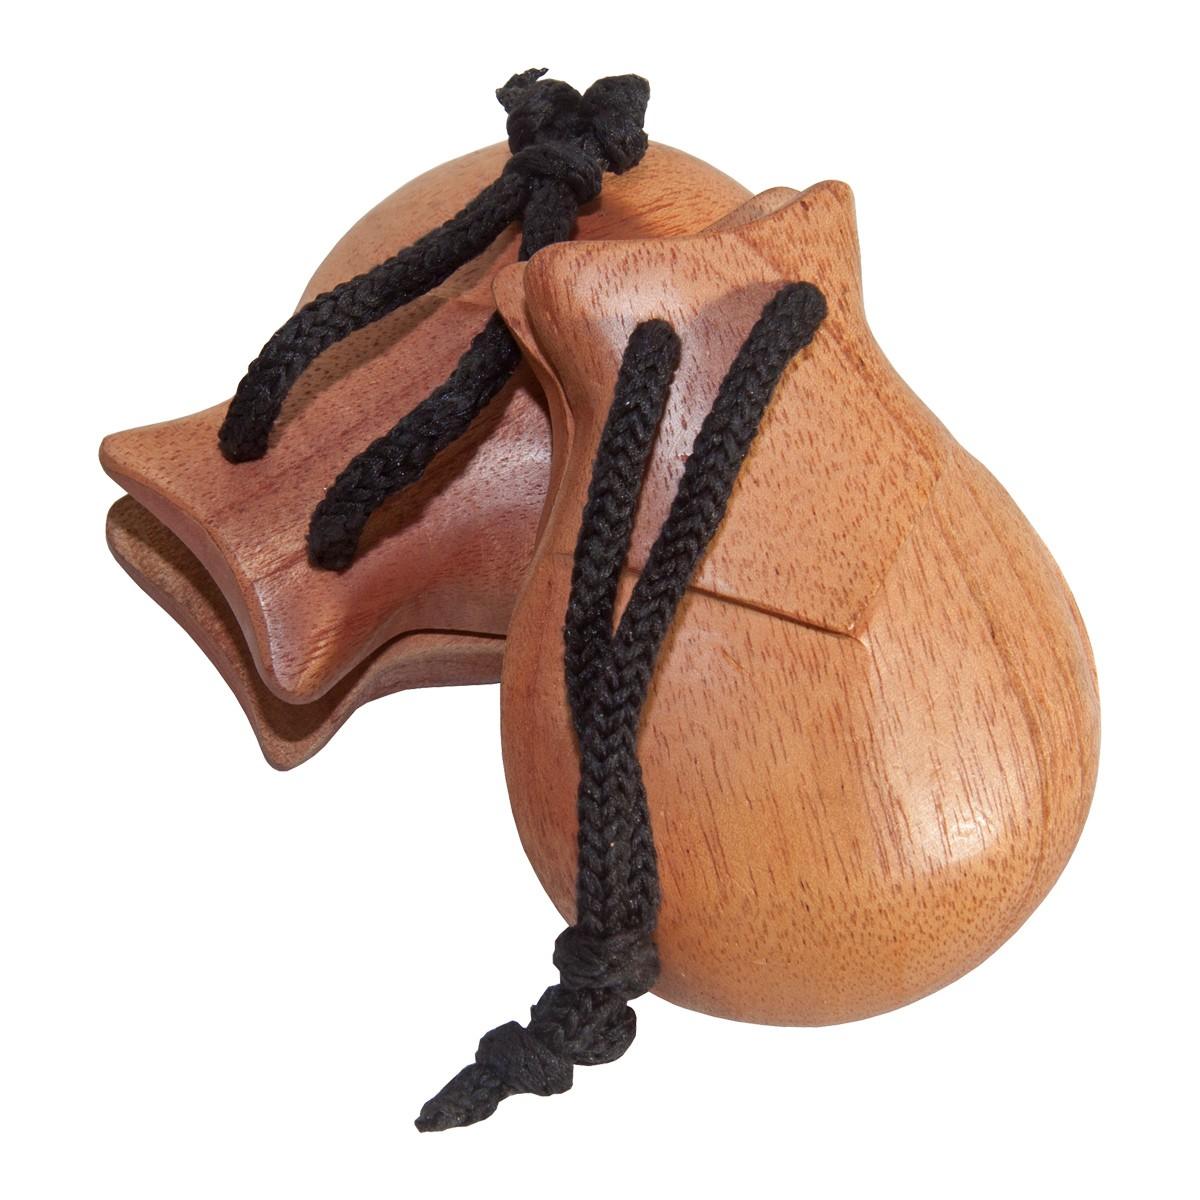 DOBANI Red Cedar Castanets 2.63' - Pair